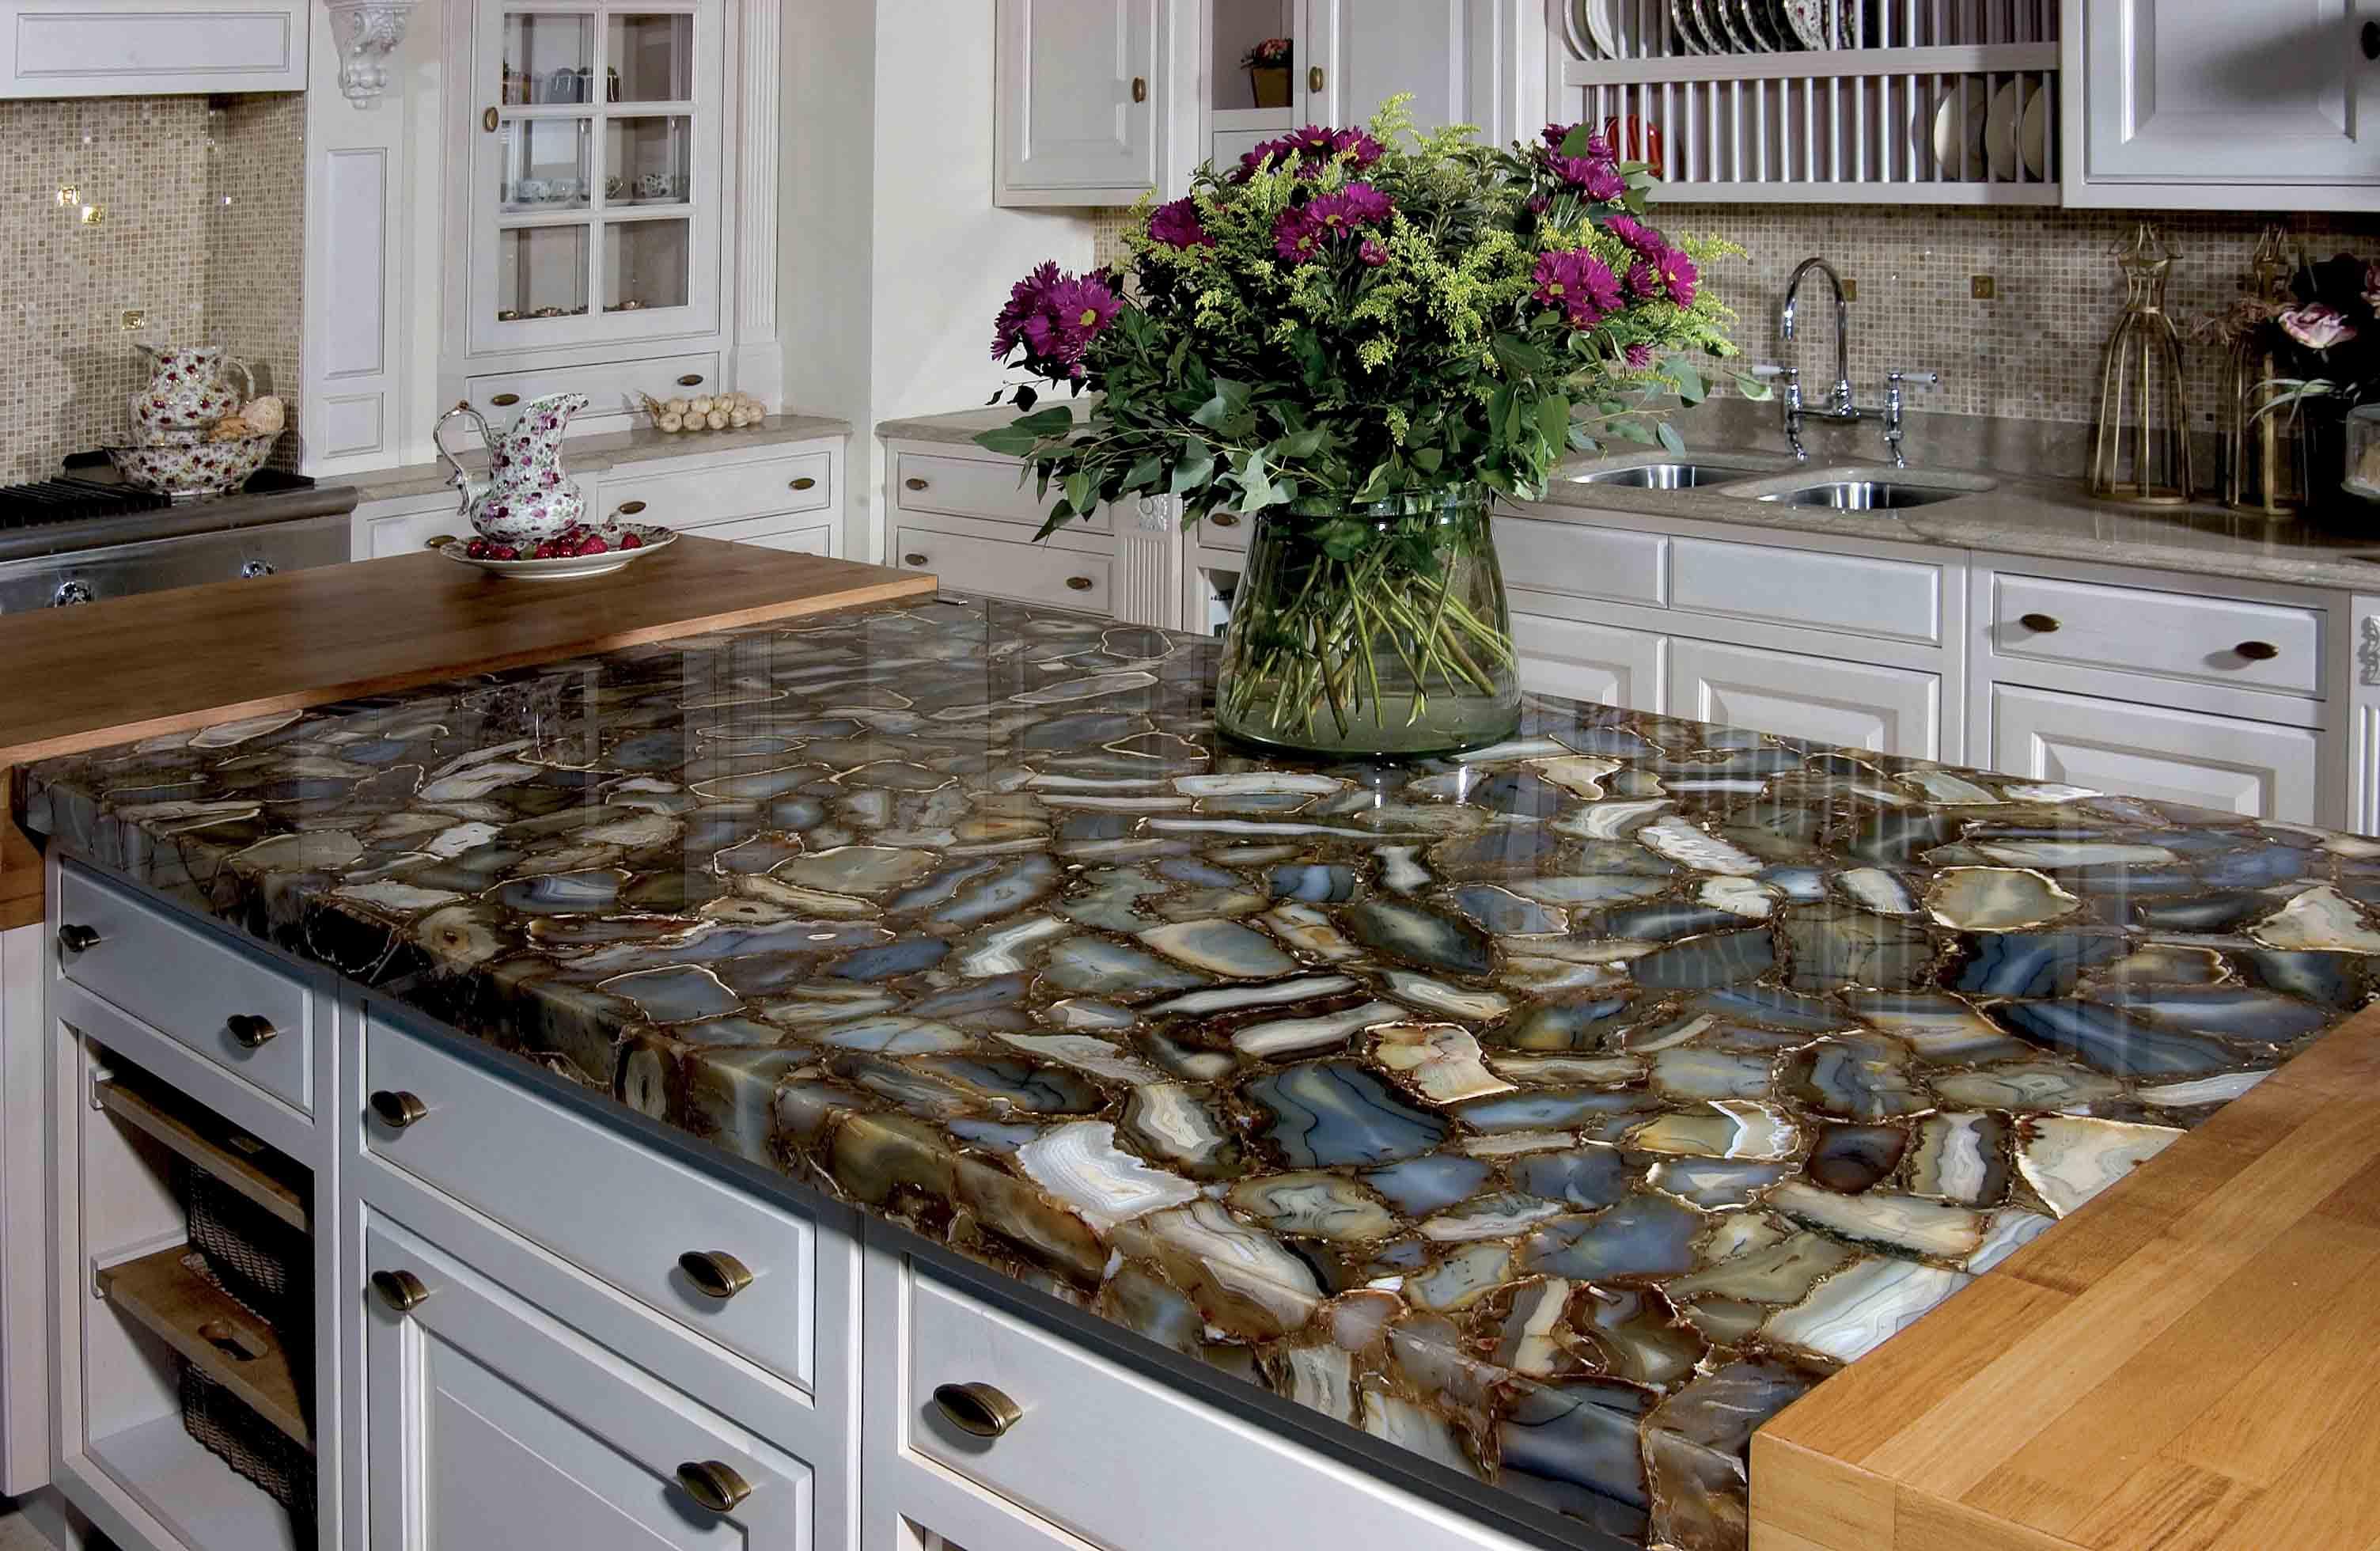 Top Granite & Quartz Countertops Supplier In St Louis MO Graniterra